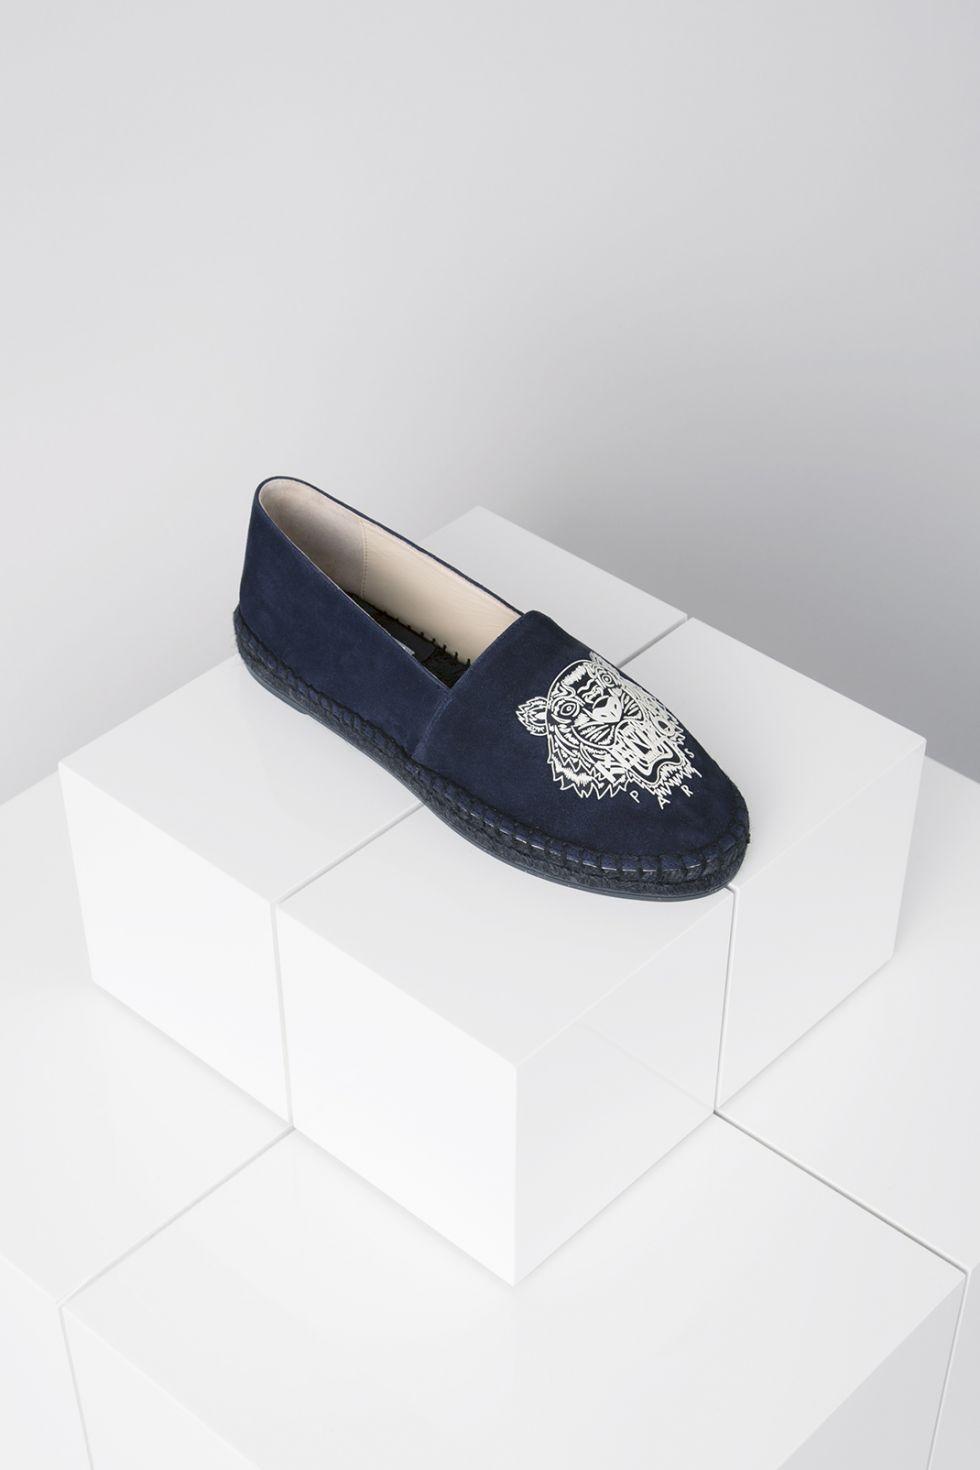 Espadrilles Tigre en Daim Kenzo - Chaussures Kenzo Femme - E-Shop Kenzo f2fde865467